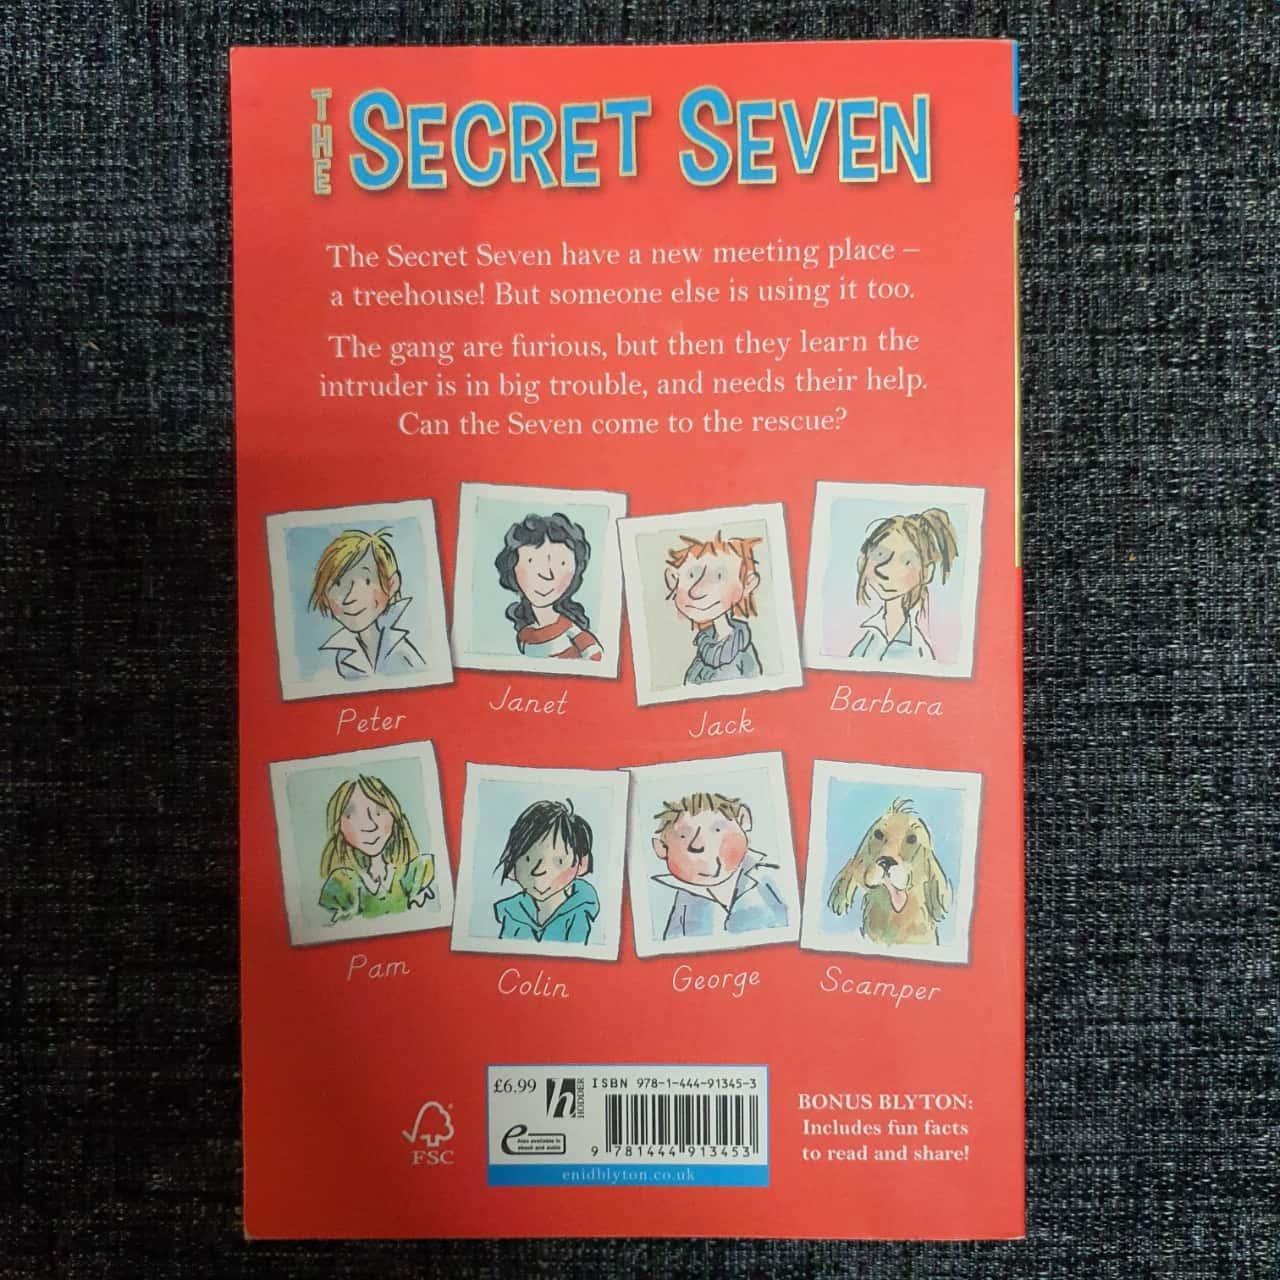 Enid Blyton *The Secret Seven* 3 book set